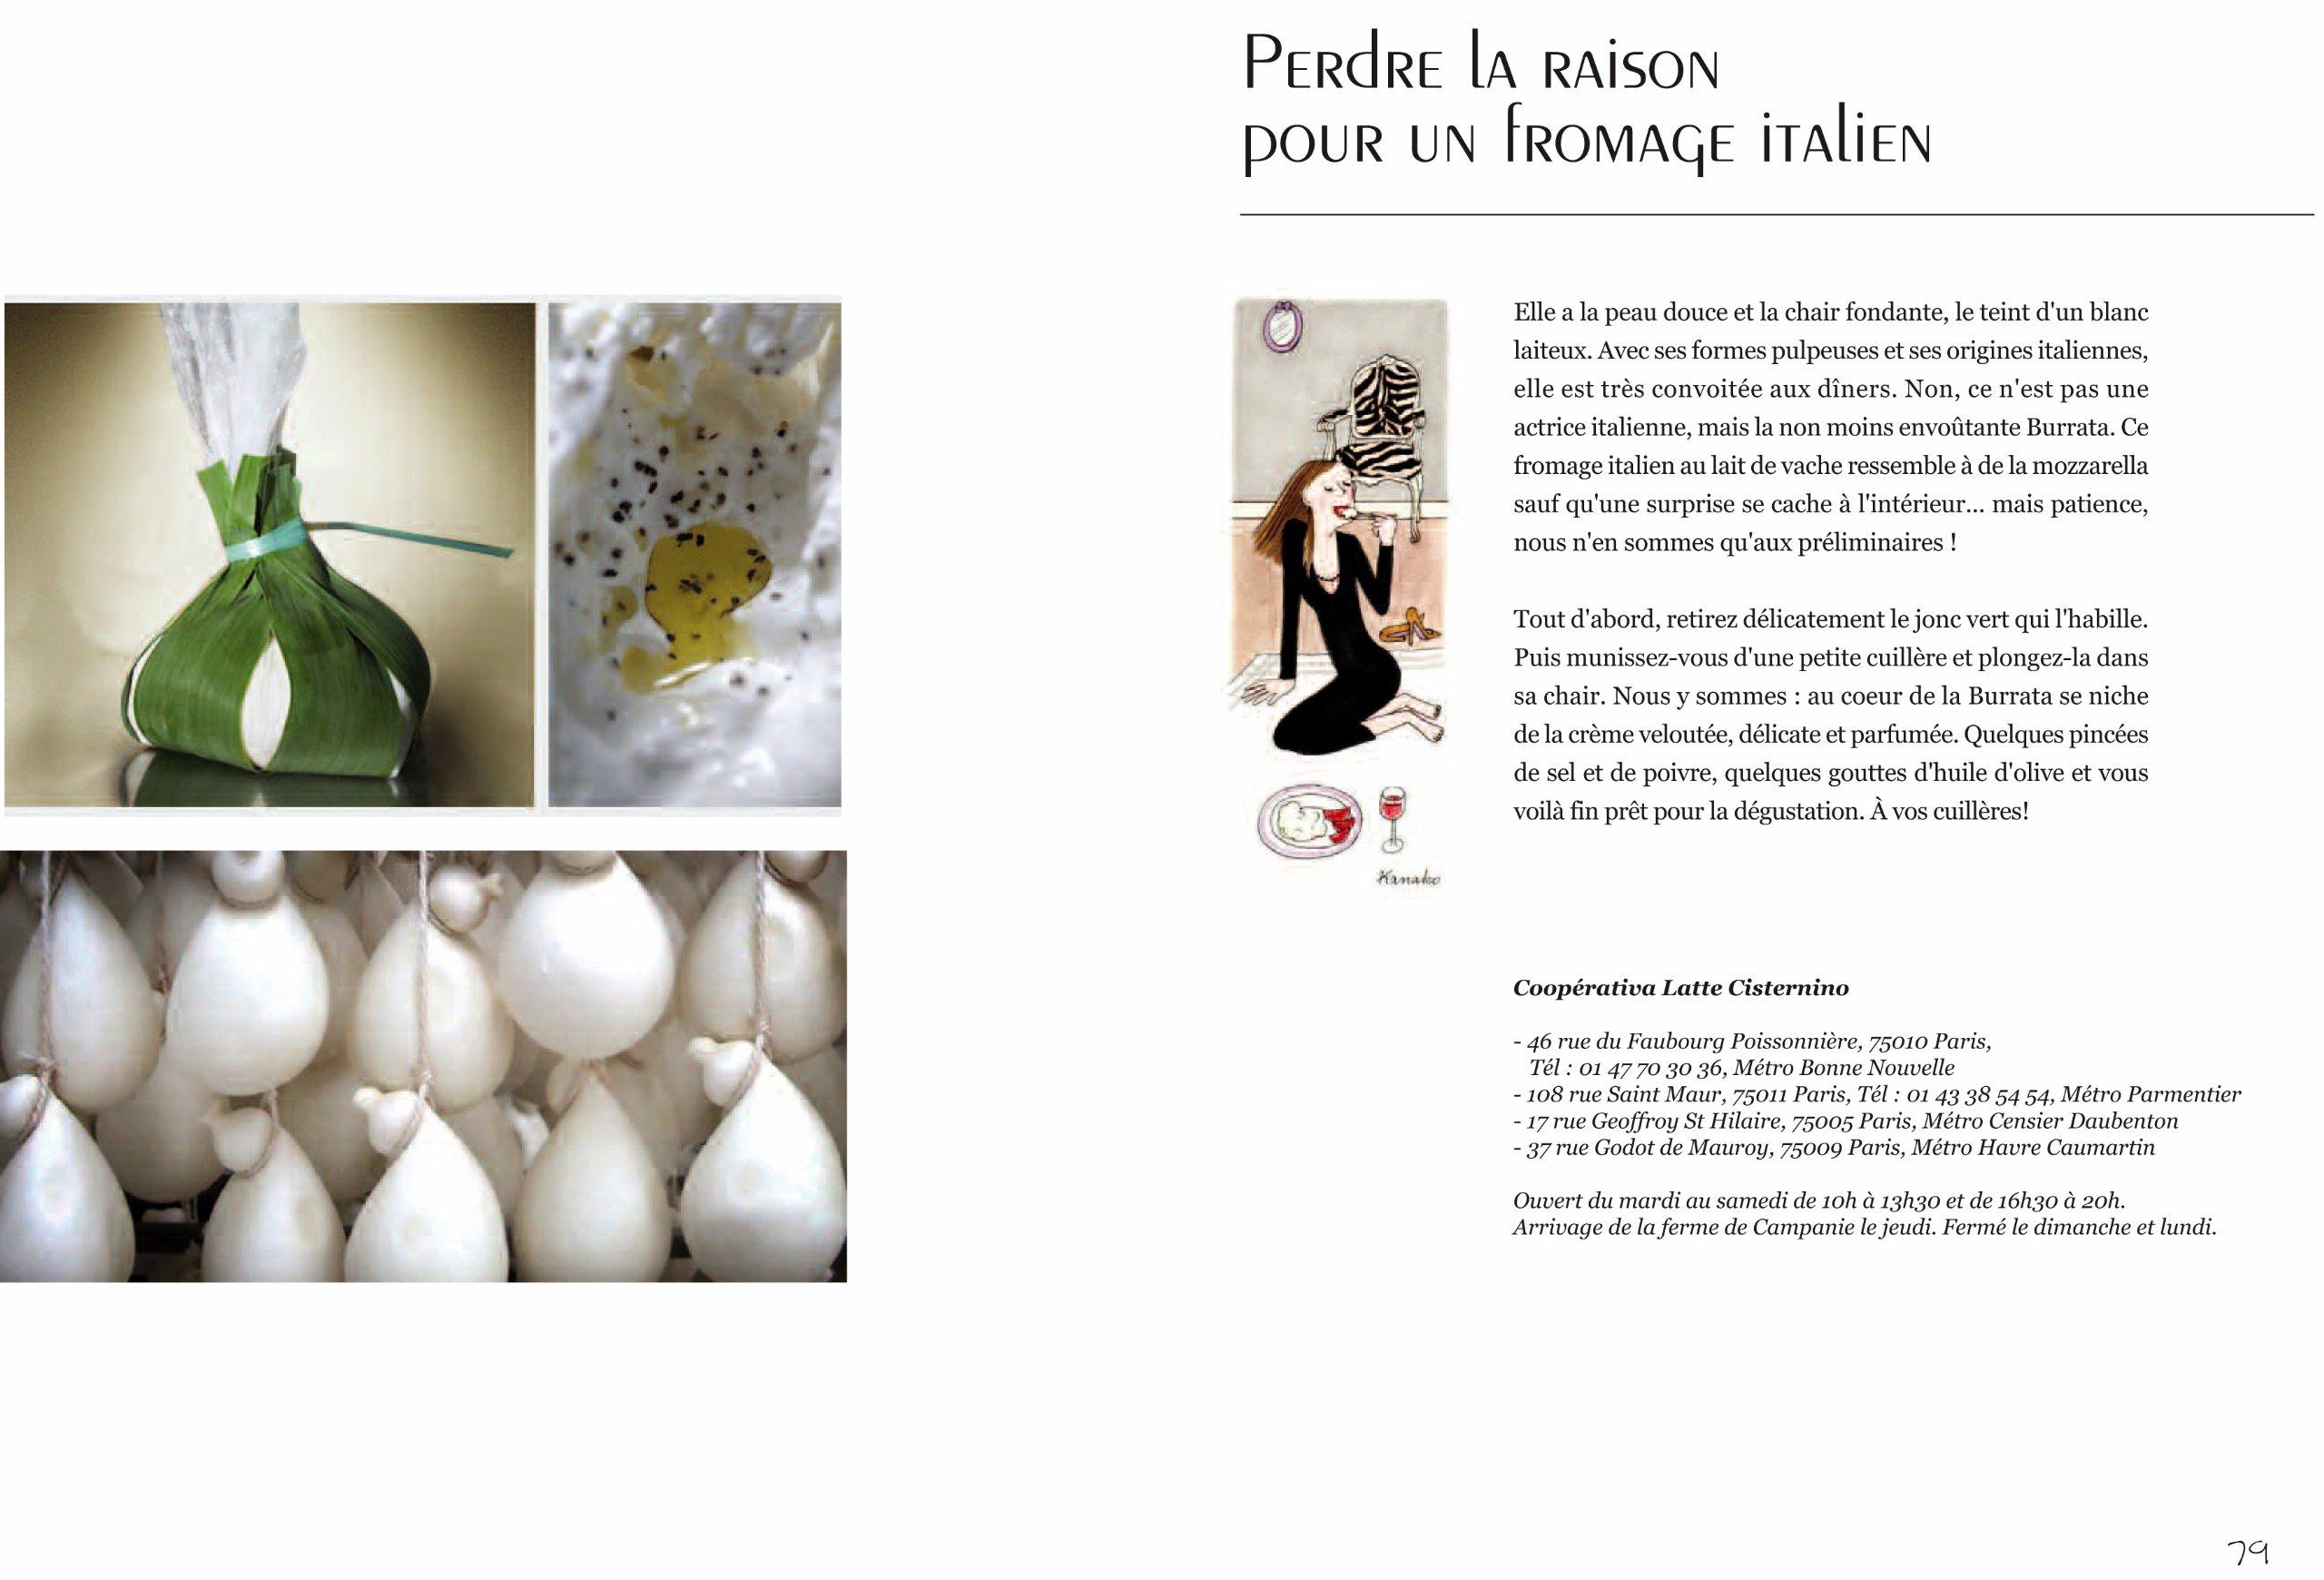 My Little Paris FL: Amazon.de: My Little Paris: Fremdsprachige Bücher